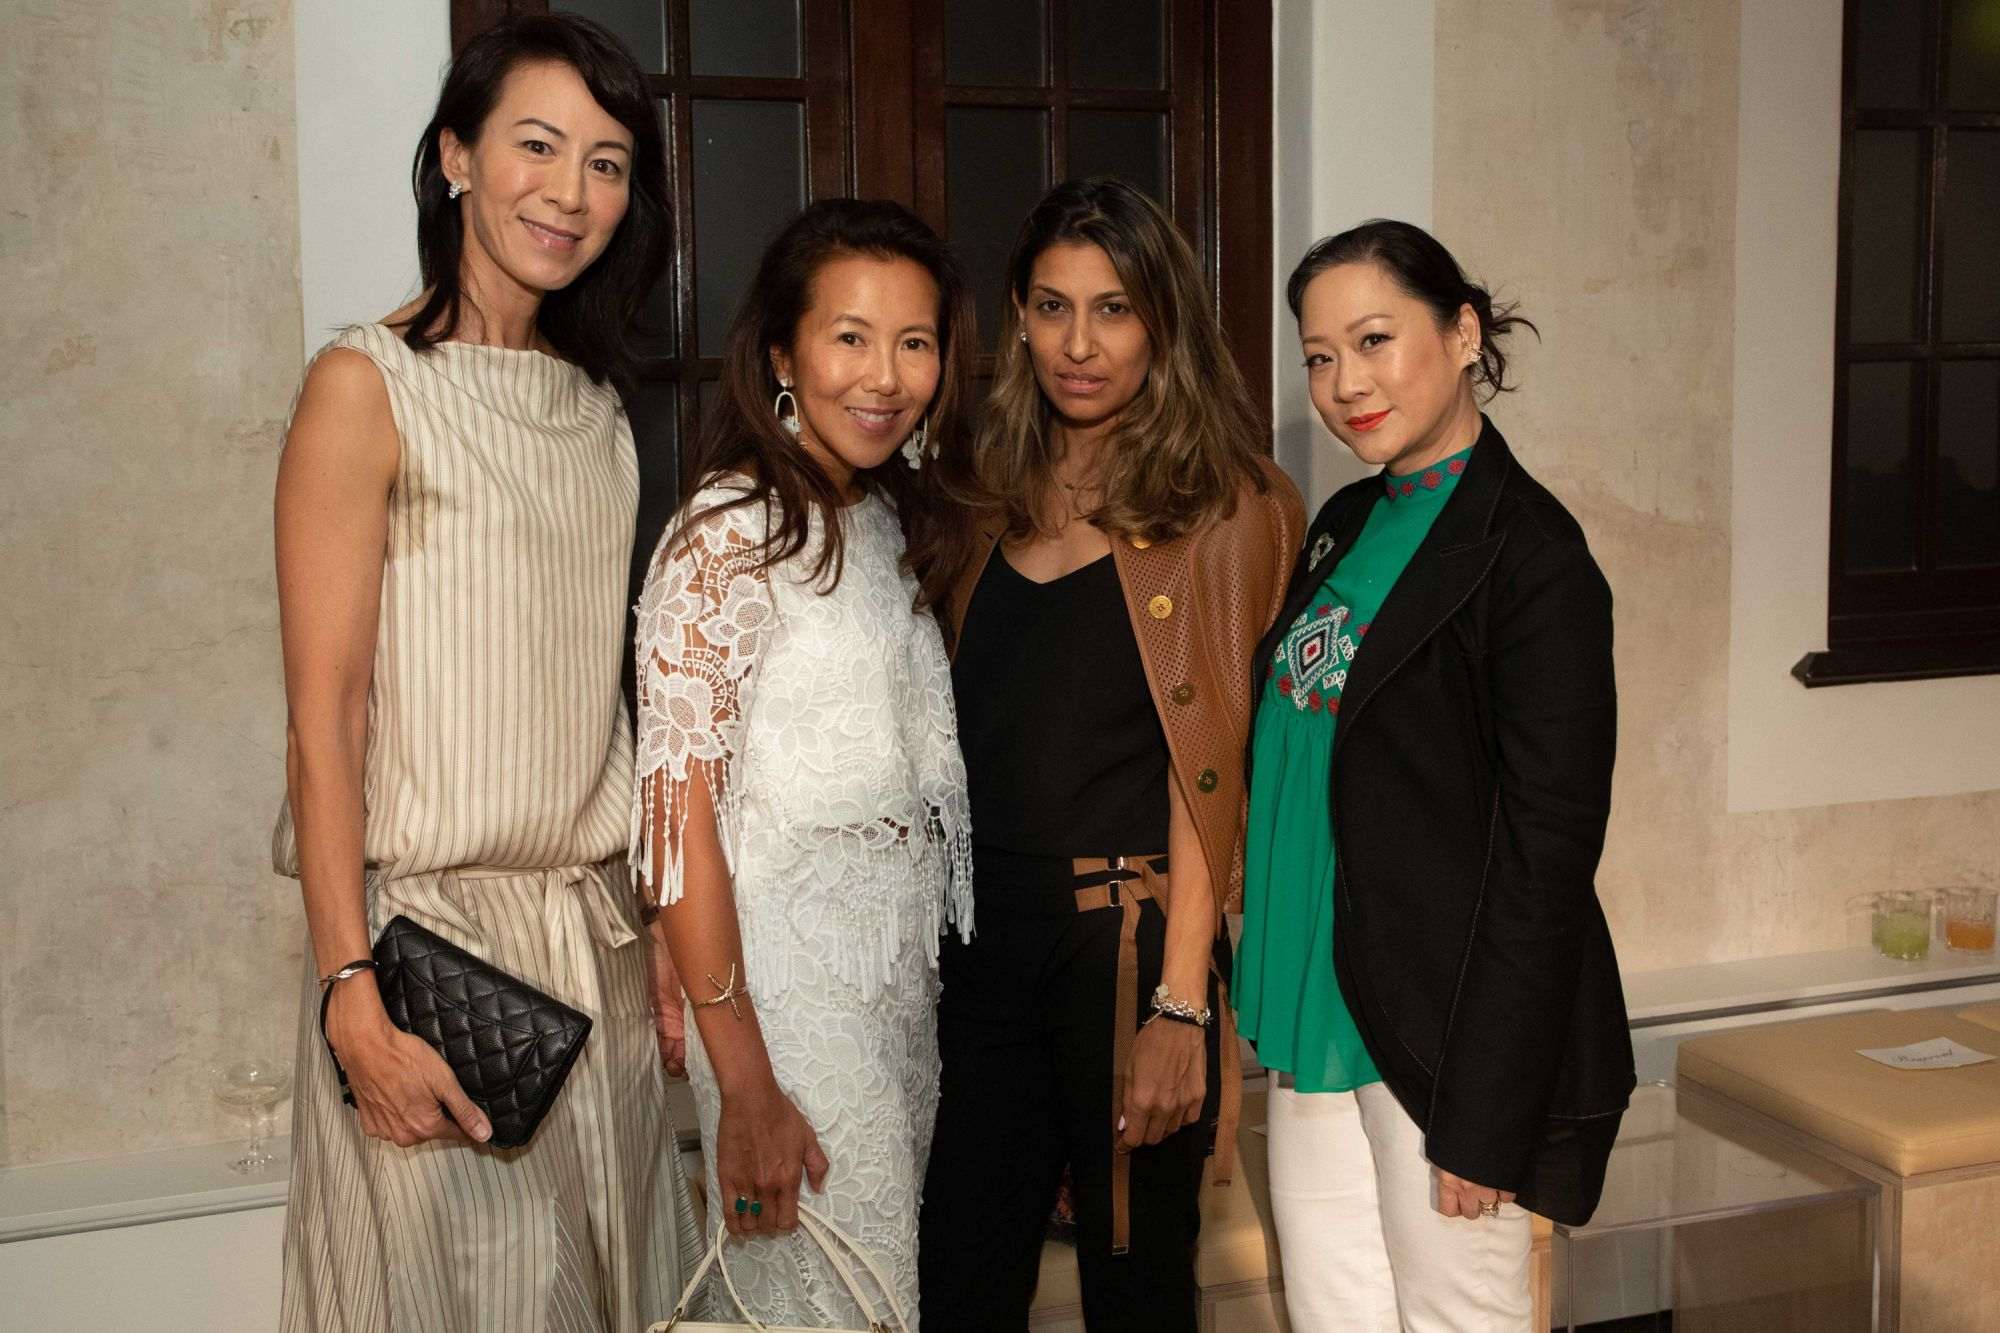 Patricia Tung-Gaw, Jacinta Yu-Kuok, Malti Dialdas, Yuda Chan